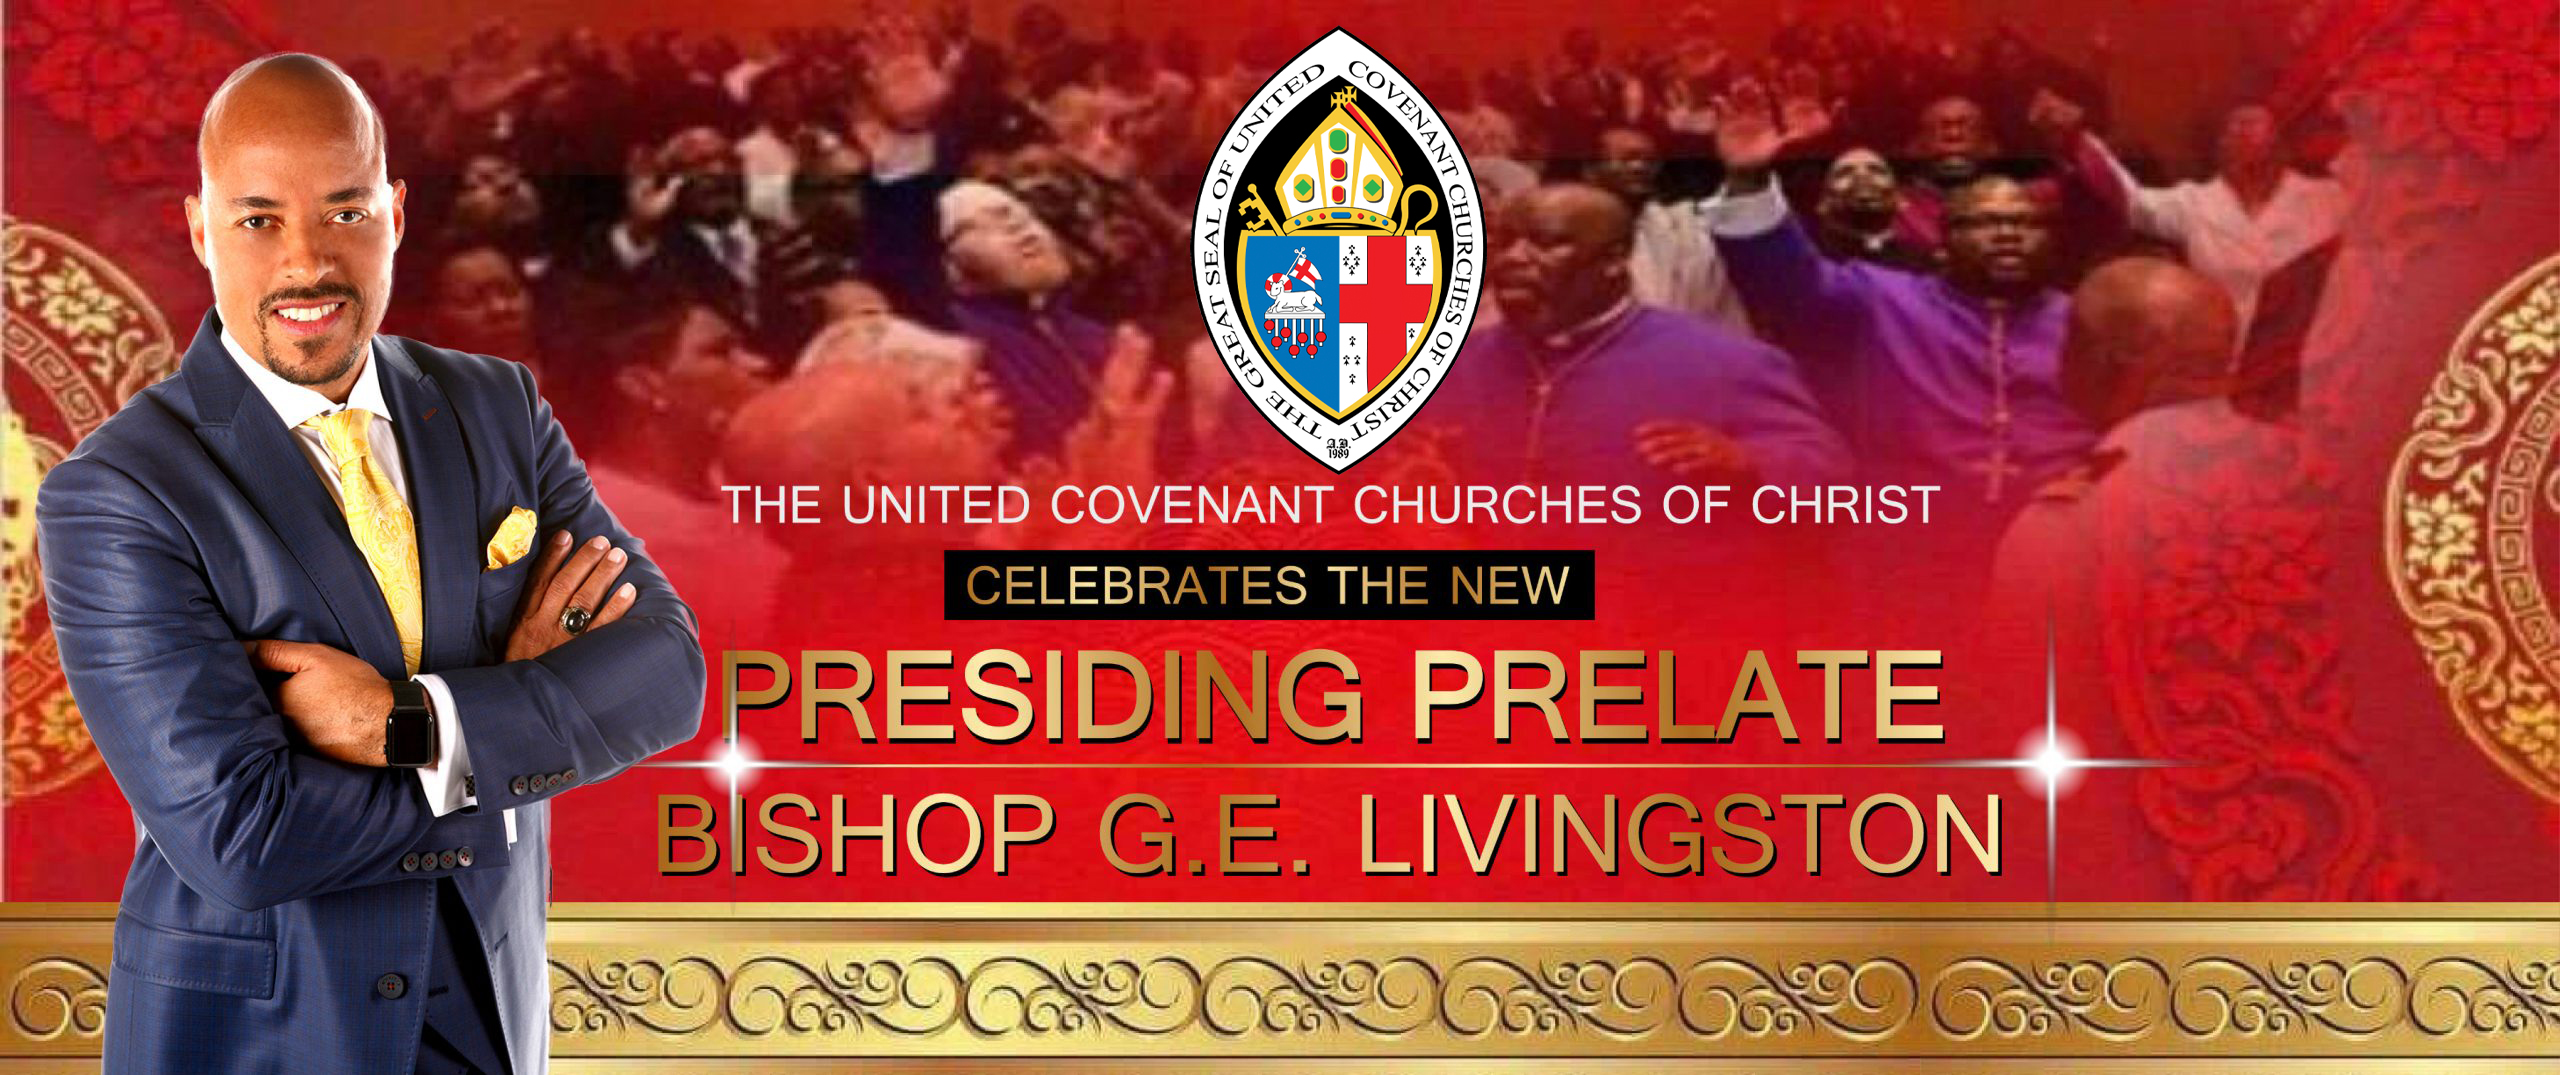 UNITED COVENANT CHURCHES OF CHRIST